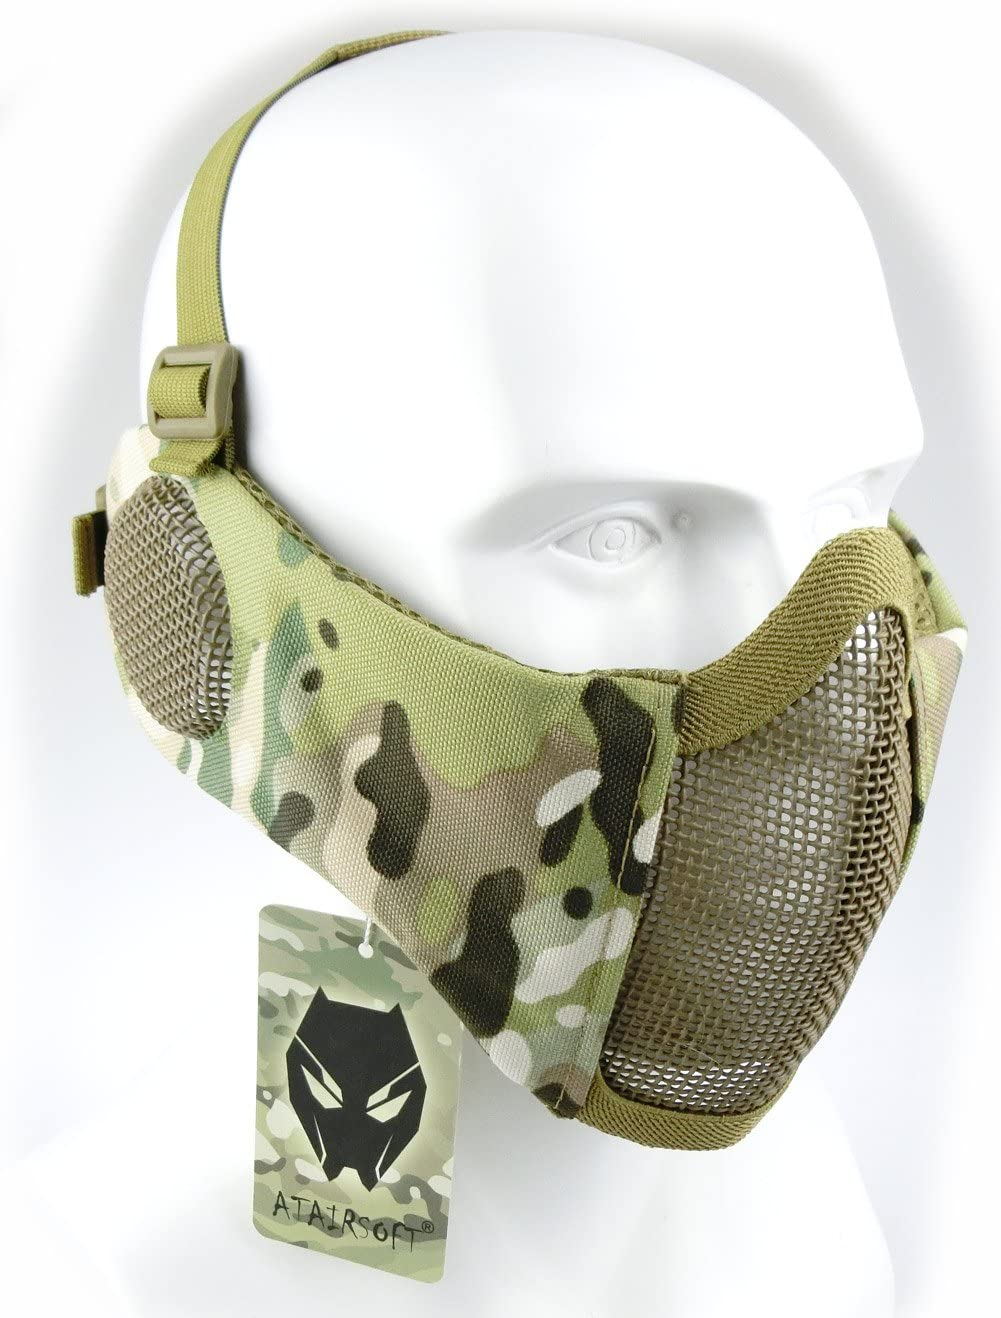 Mascarilla protectora de malla inferior de nailon con cubierta para la oreja de Worldshopping4U, Tactical Airsoft CS, MC